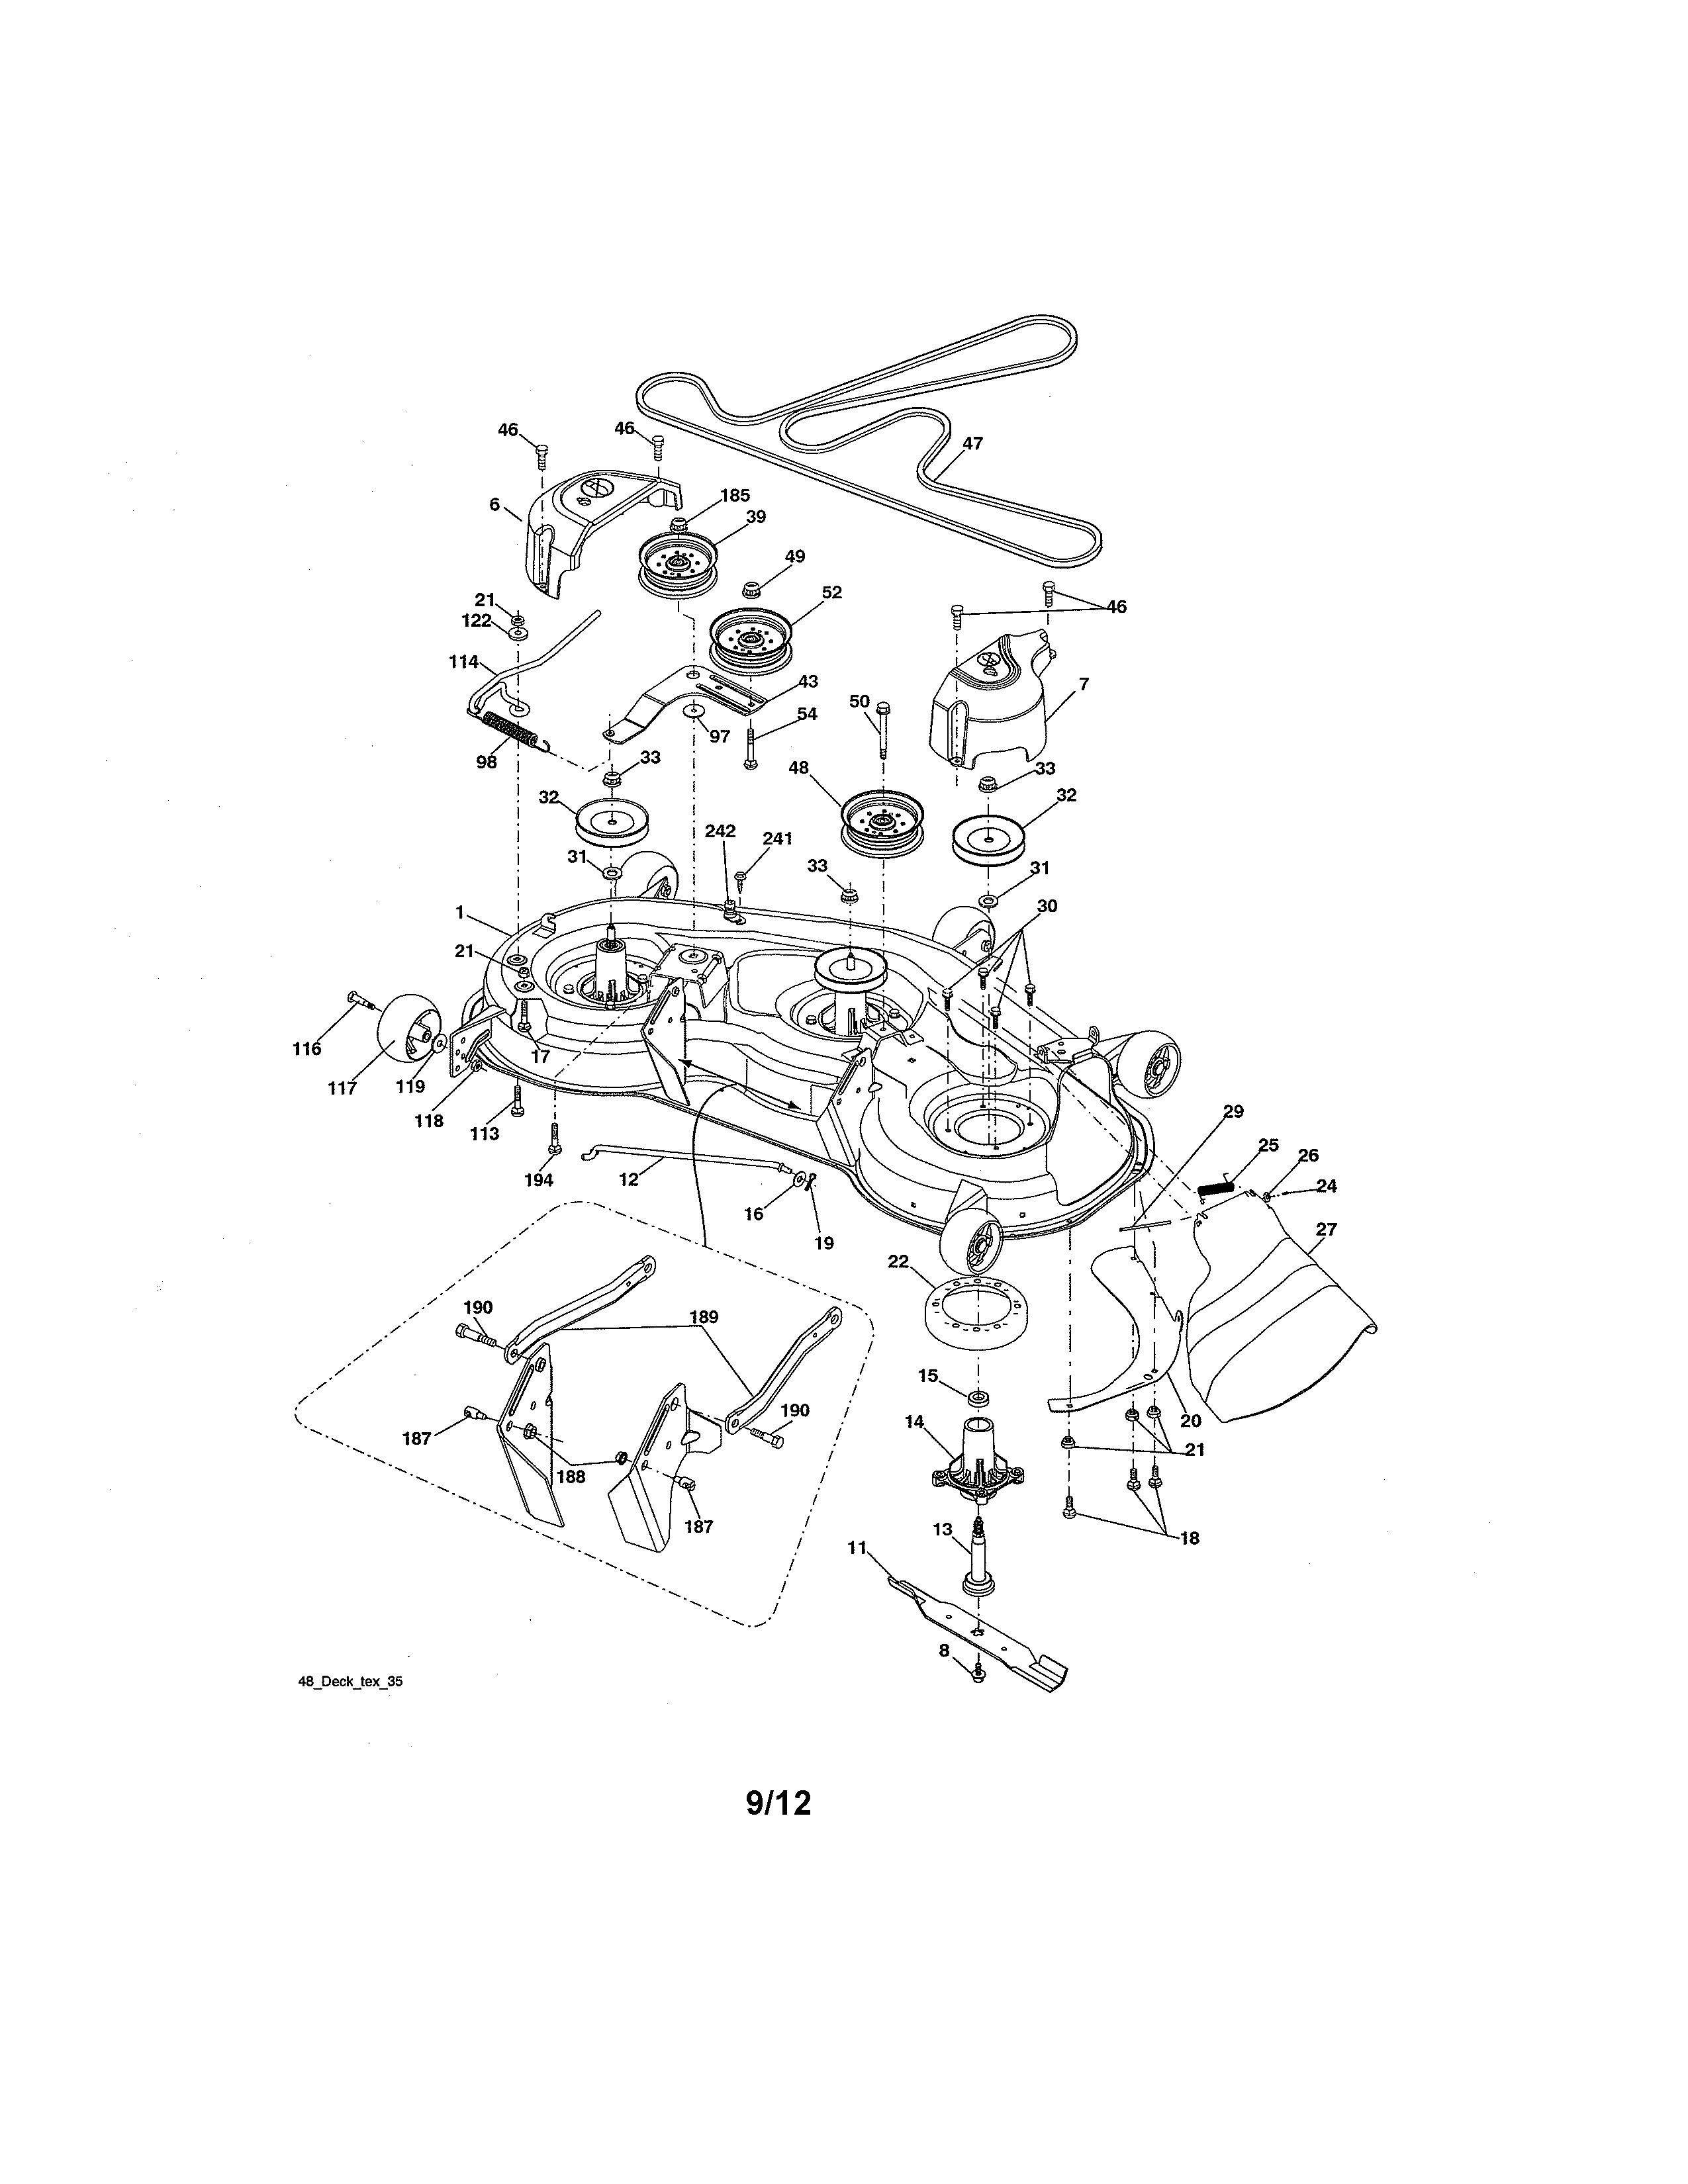 Craftsman Lawn Mower Parts Diagram Mower Deck Diagram & Parts List for Model Craftsman Parts Of Craftsman Lawn Mower Parts Diagram